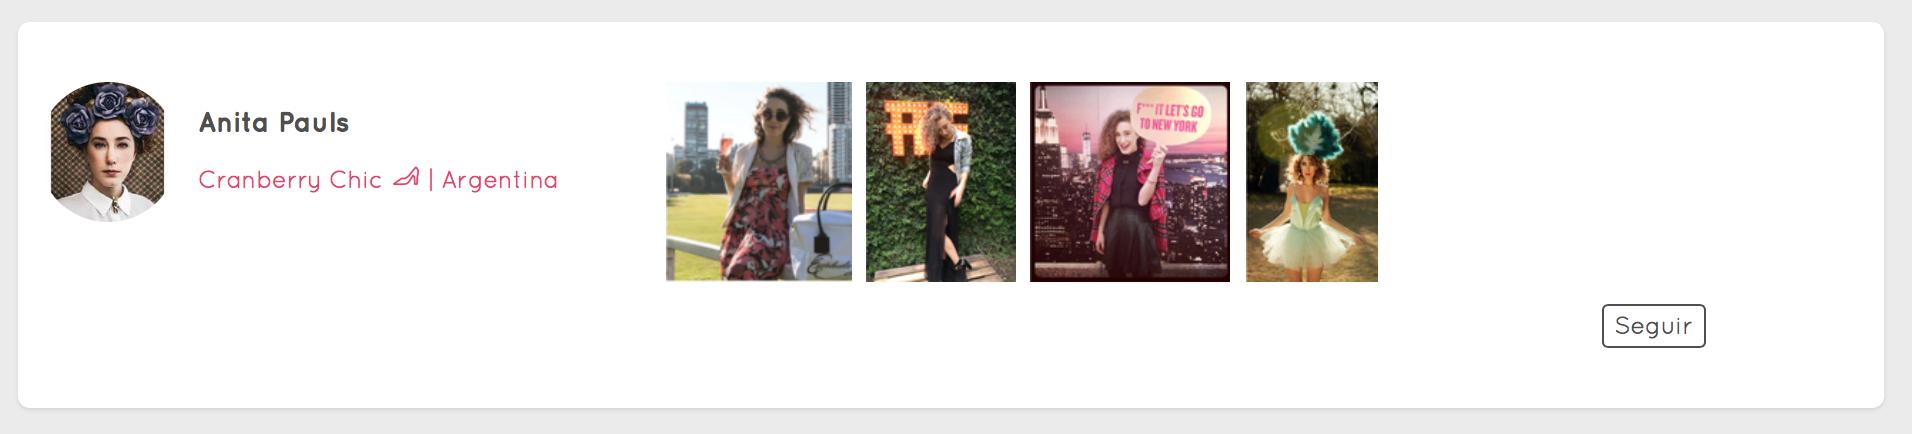 #News Cranberrychic: la nueva red social de moda que tenés que usar